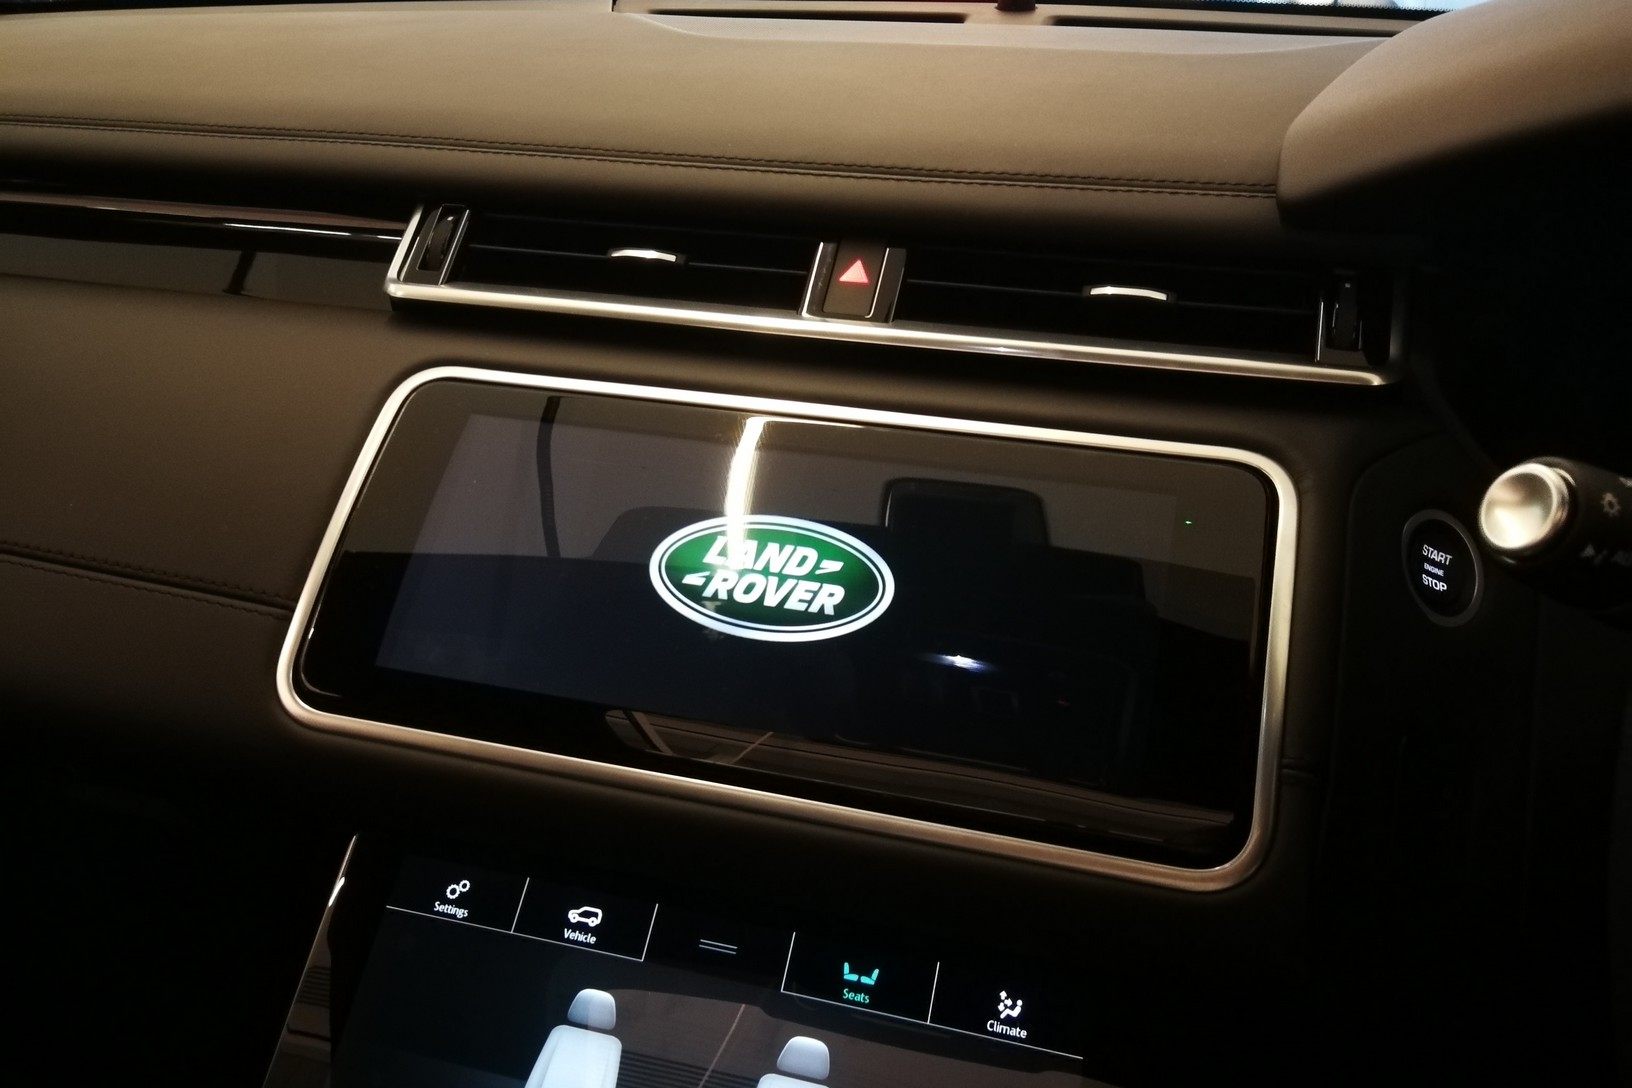 Land Rover Range Rover Velar 5.0 P550 SVAutobiography Dynamic Edition image 11